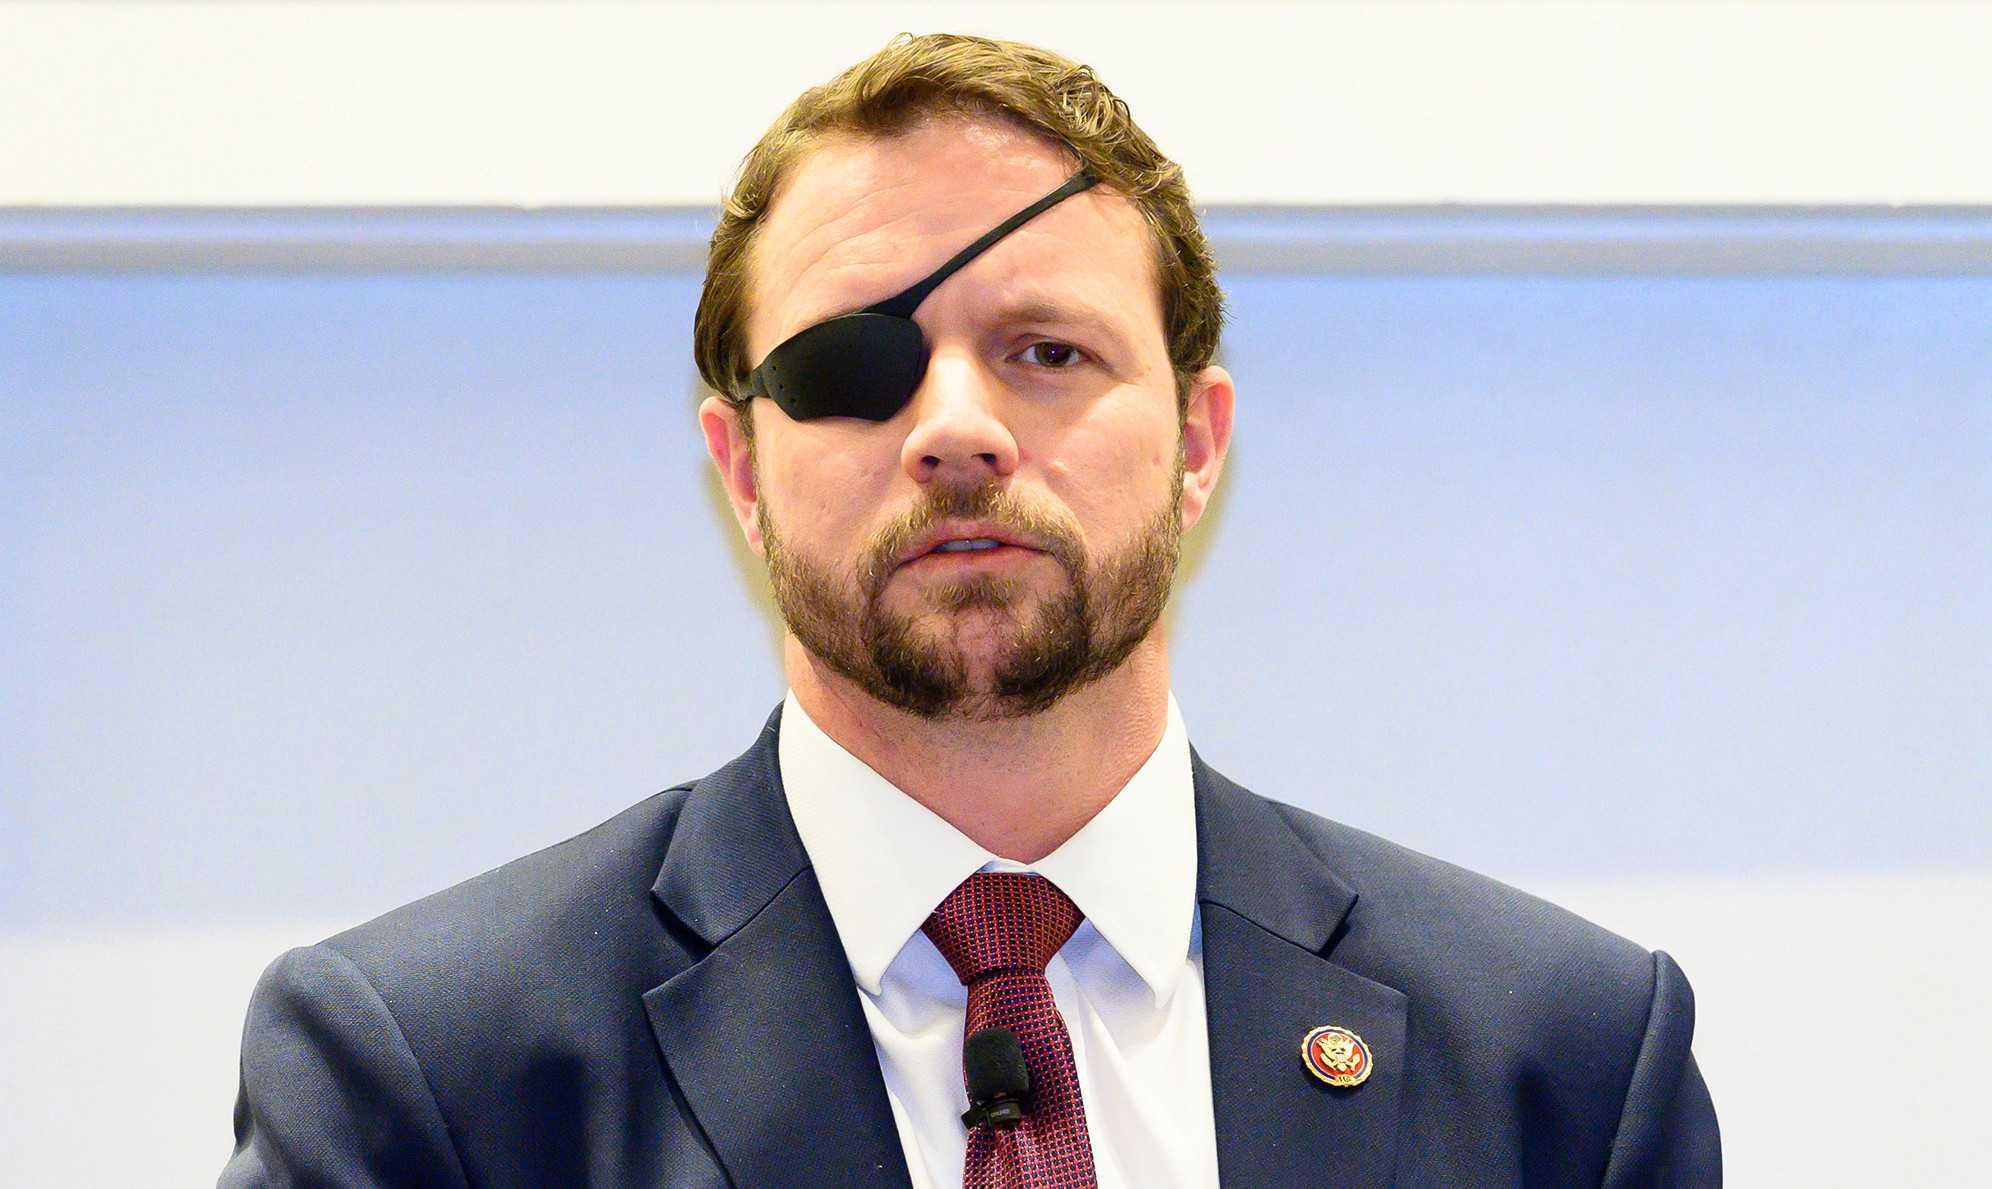 Dan Crenshaw Politiican